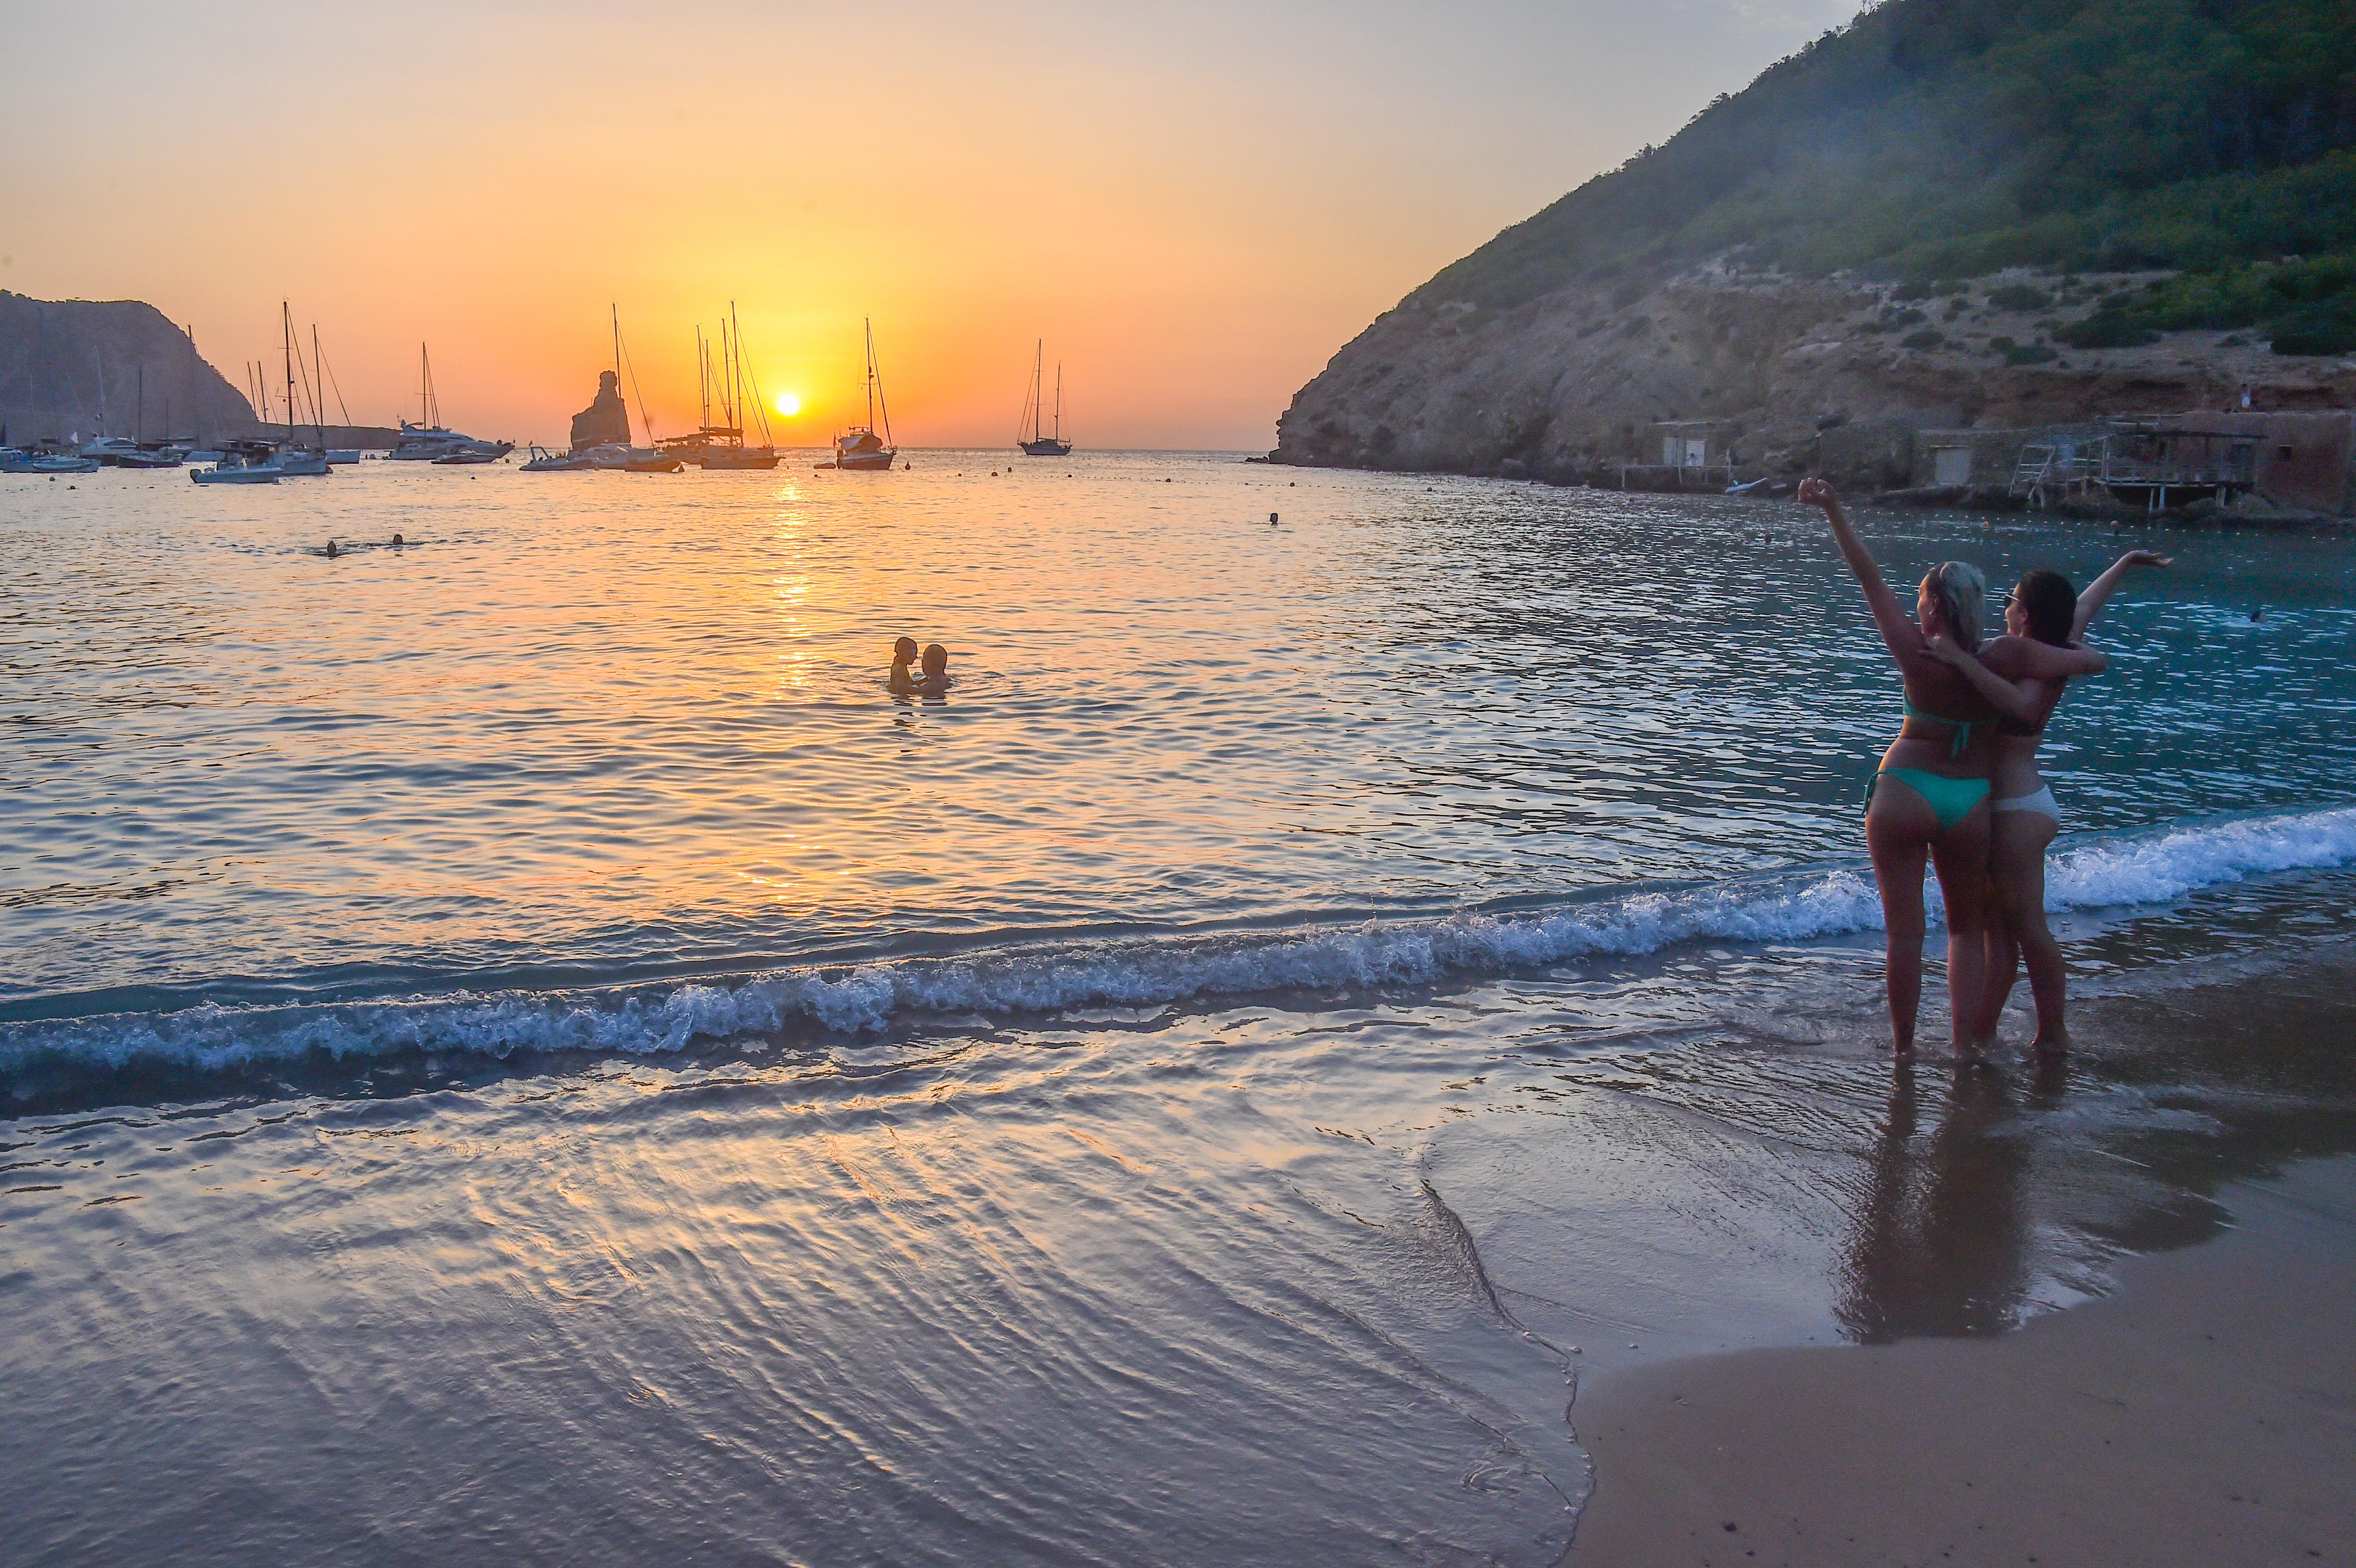 Ibiza and Formentera Beaches General Views